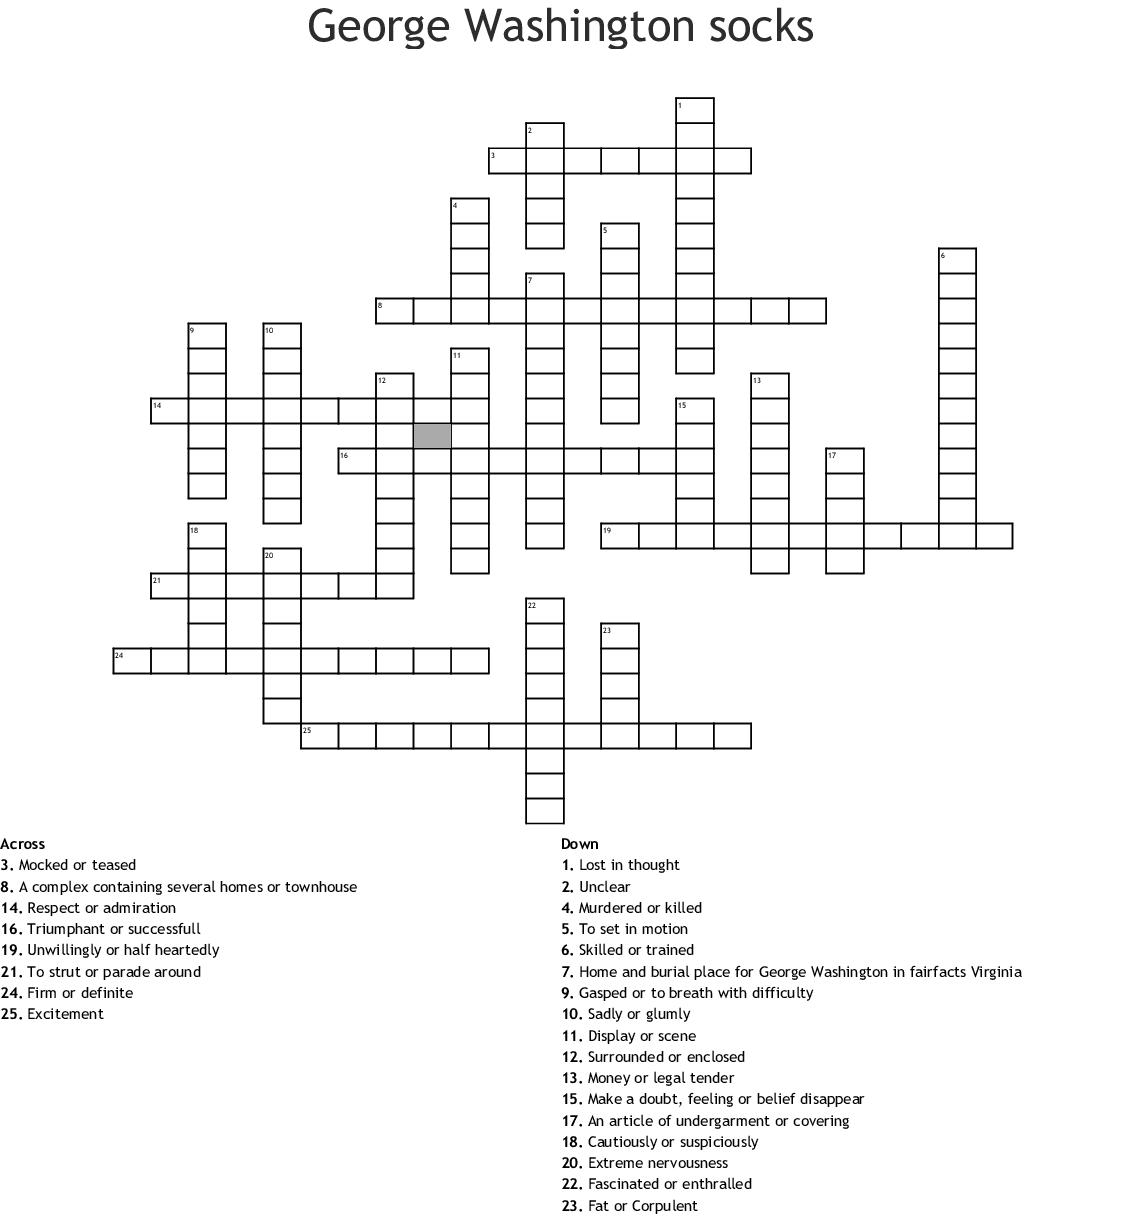 George Washington S Socks Crossword Puzzle